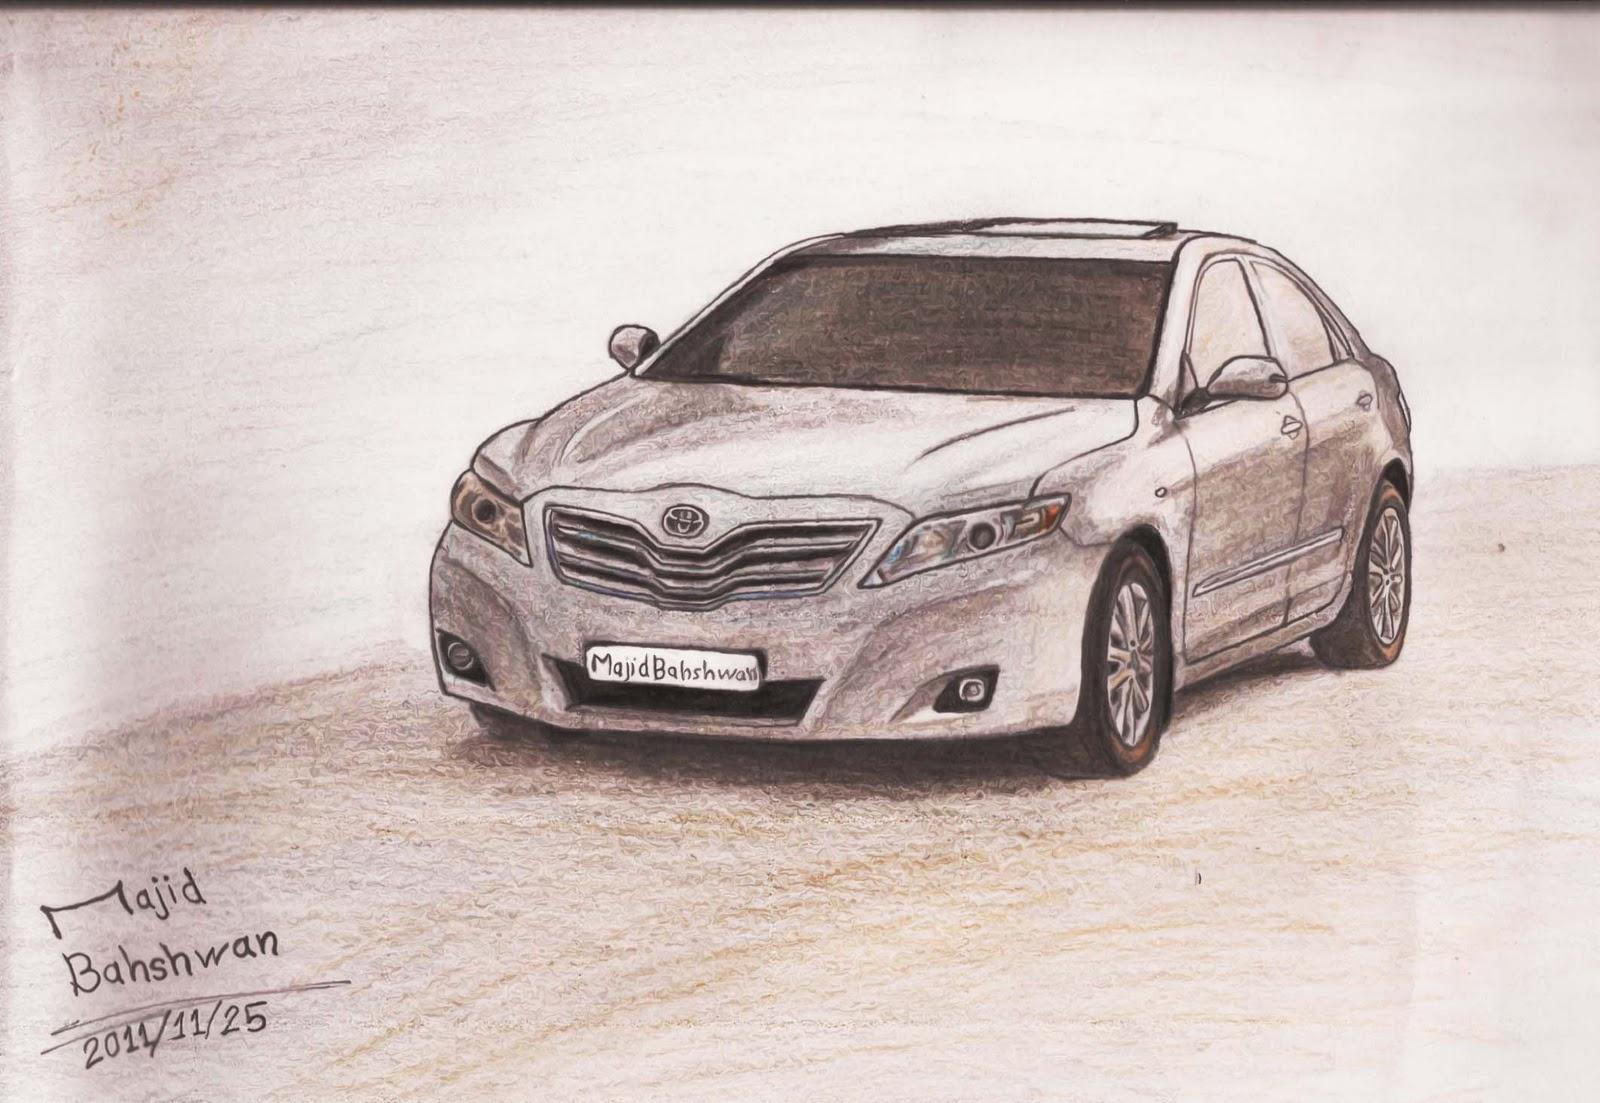 Panzen خطوات رسم سيارة بالصور